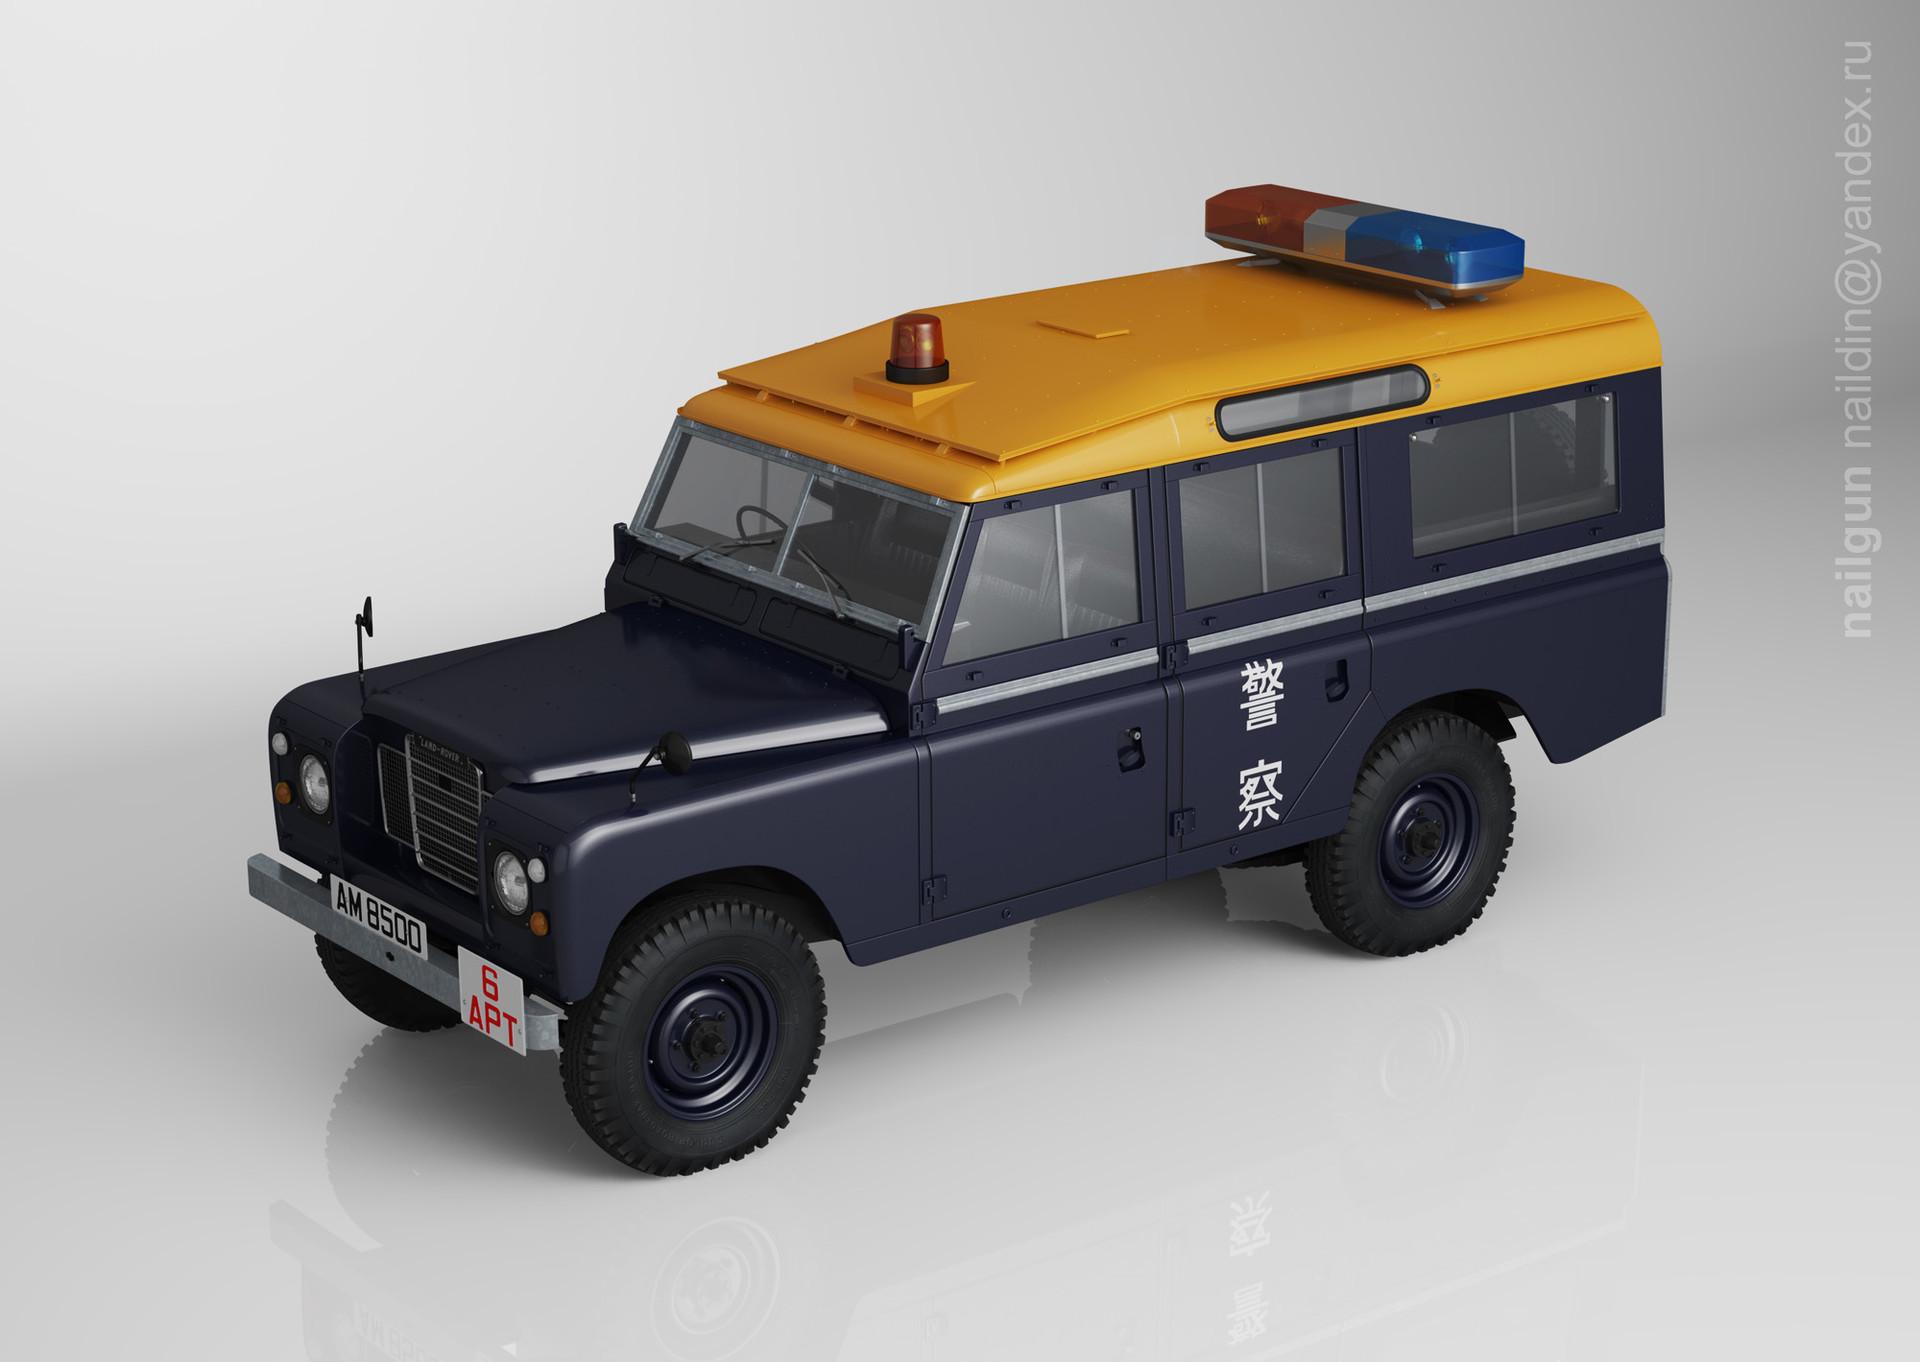 Nail khusnutdinov pwc 009 000 land rover 109 police marine miniature